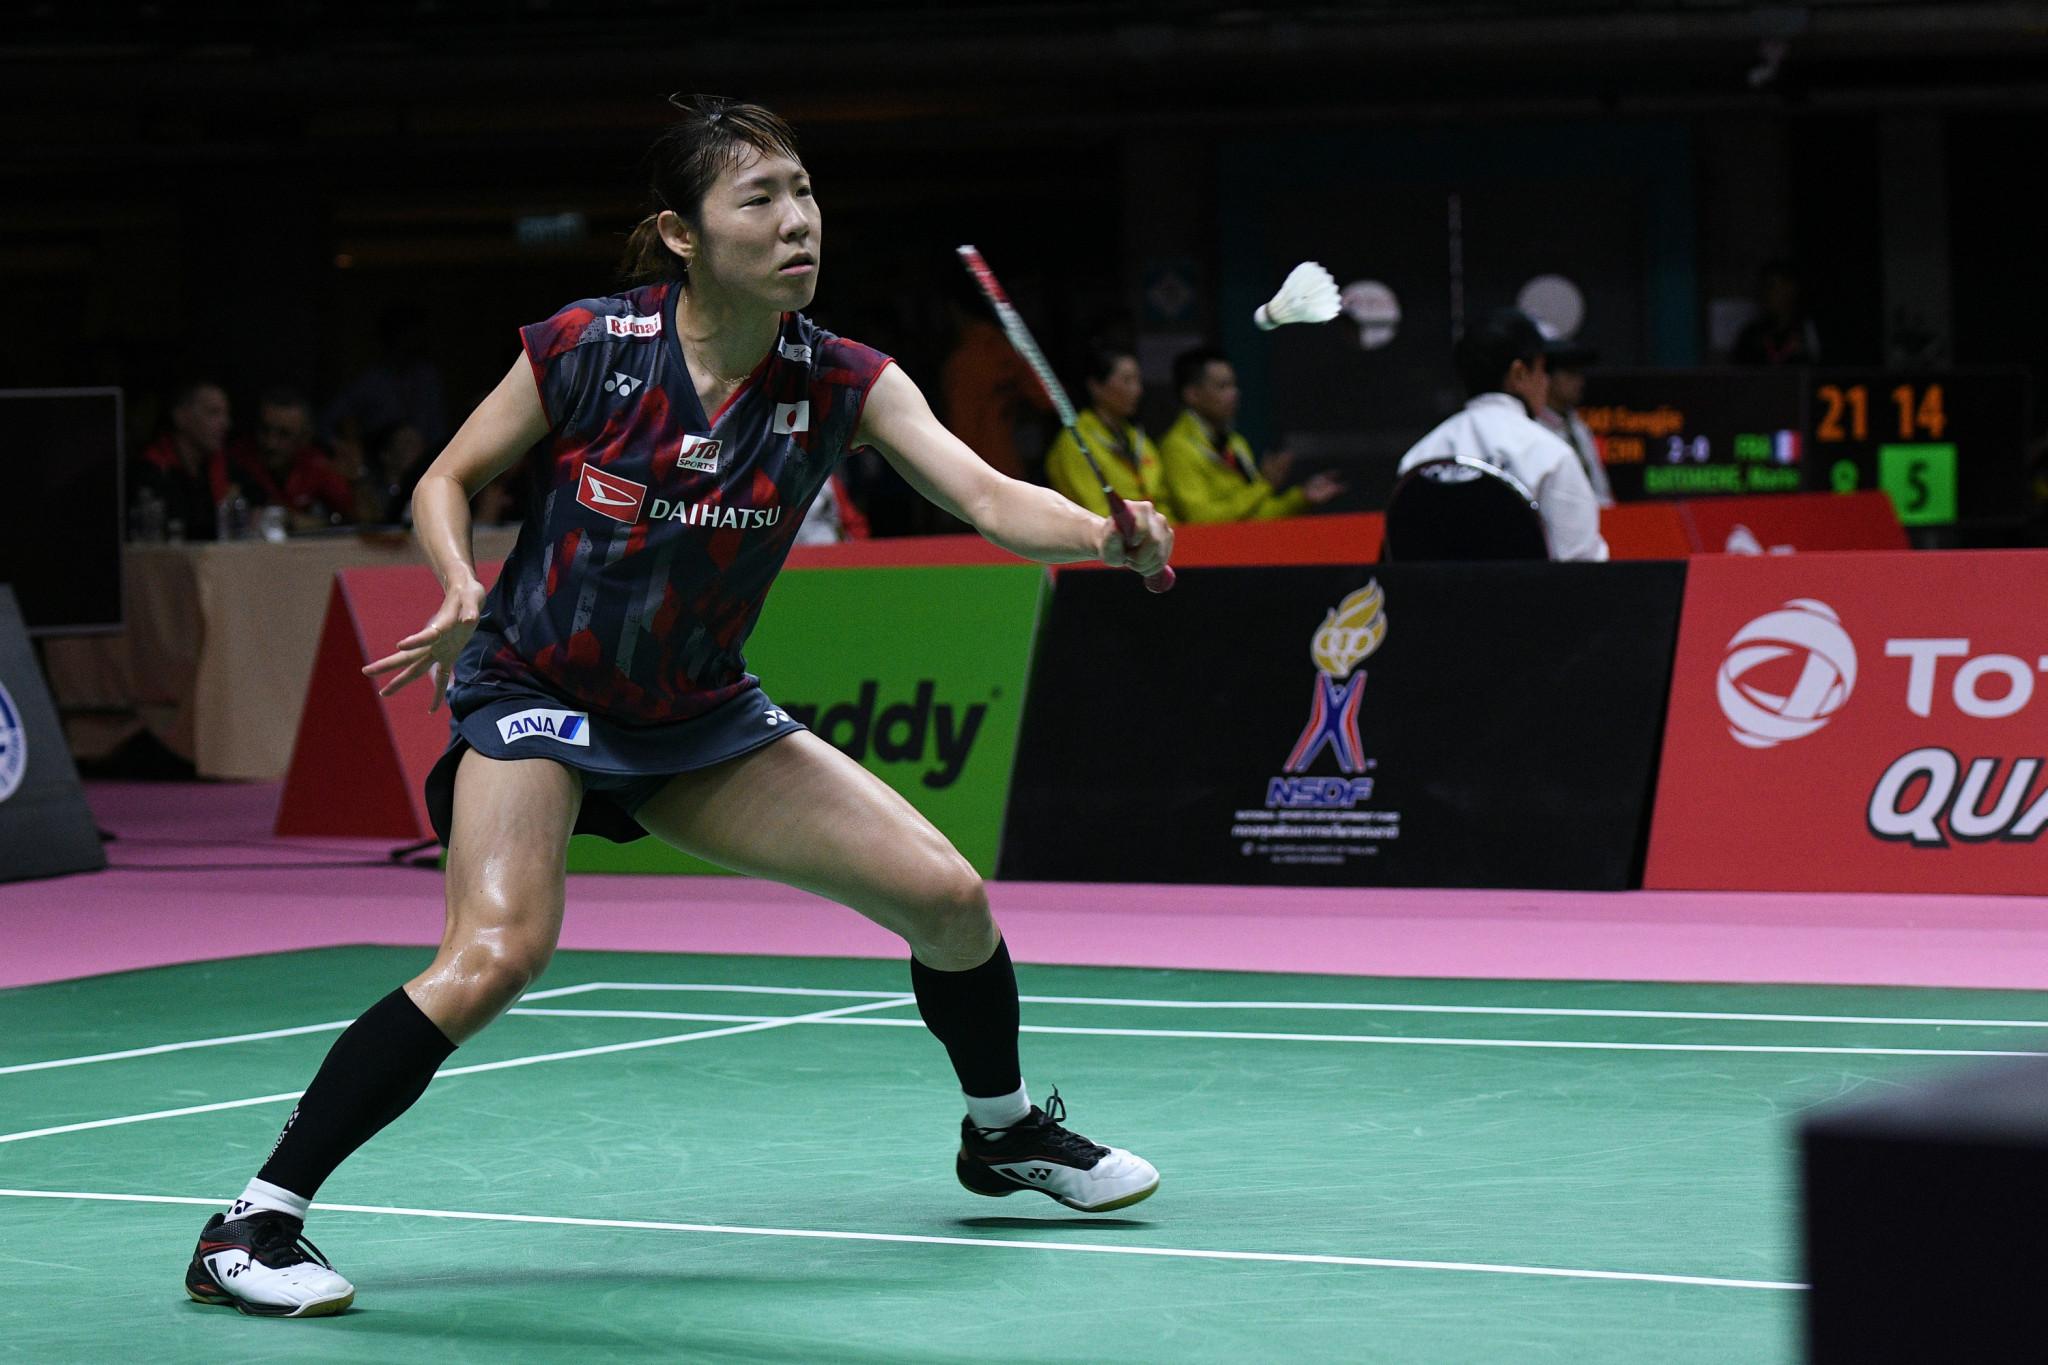 Sato suffers second round loss at U.S. Open Badminton Championships